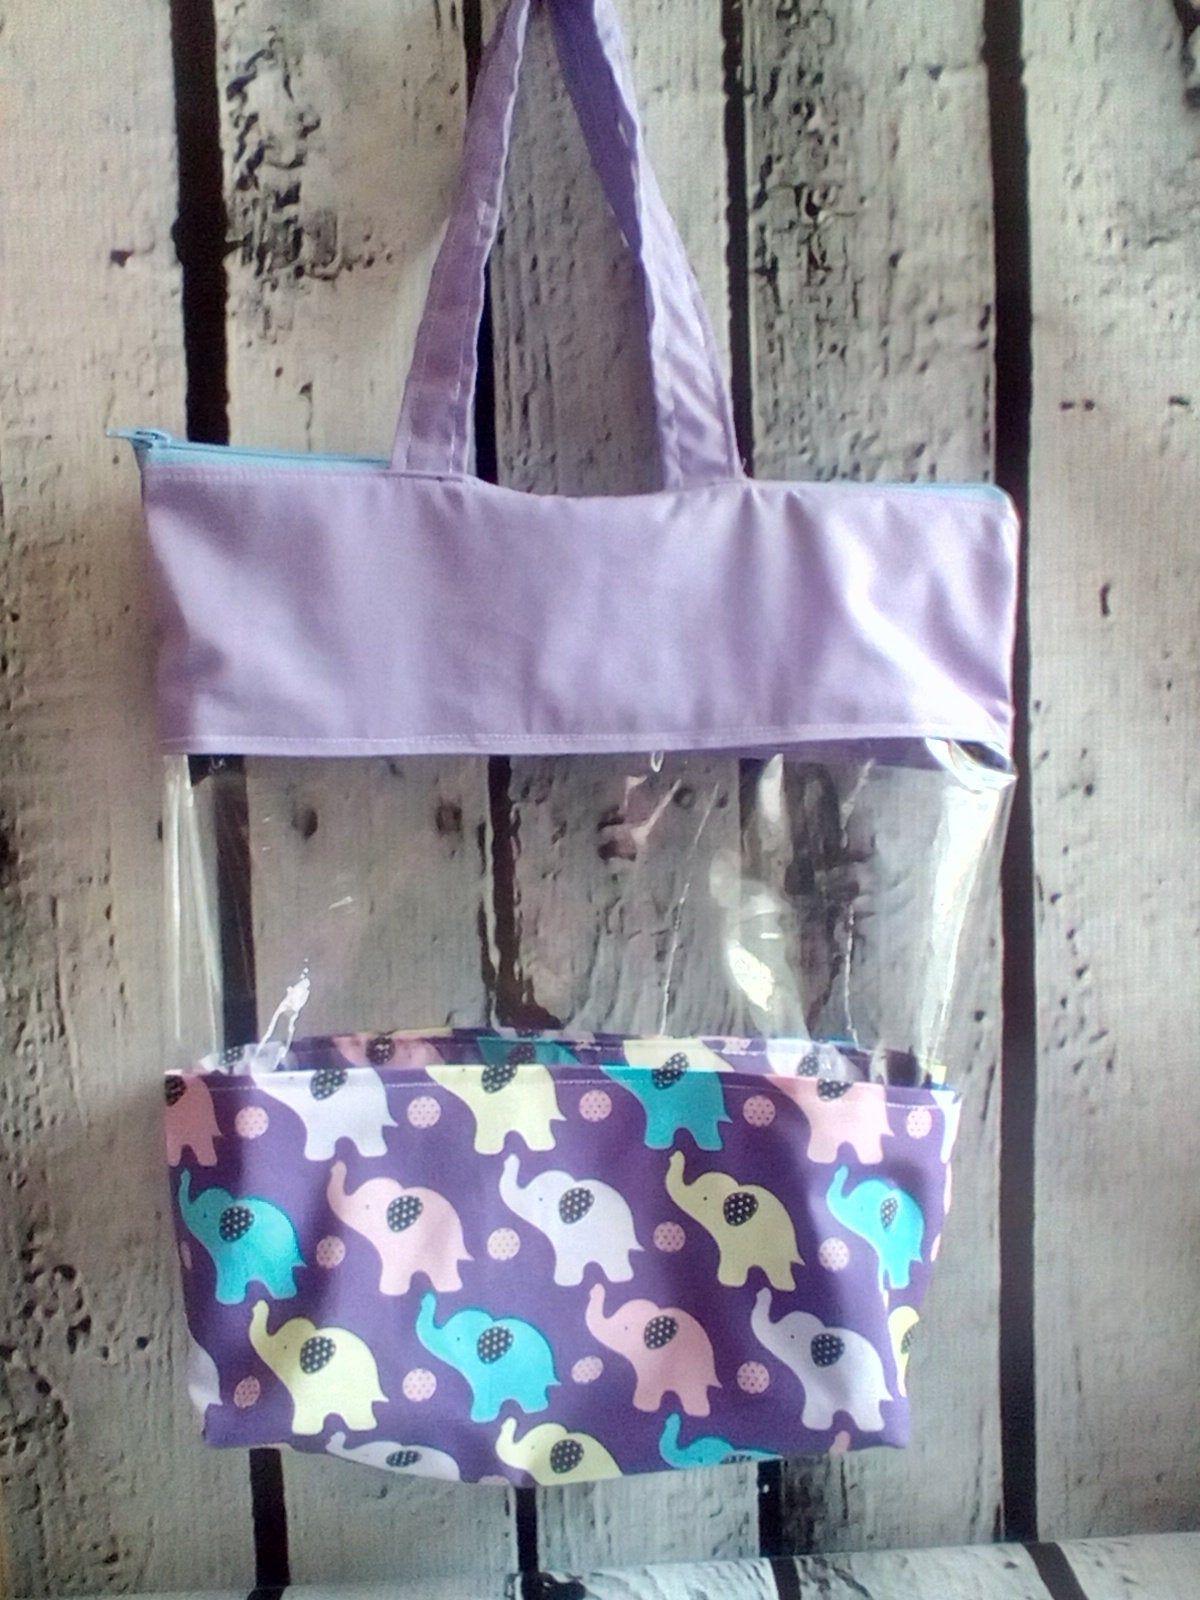 Large Vinyl Beach Bag Tote For Kids Bags Beach Bag Beach Tote Bags